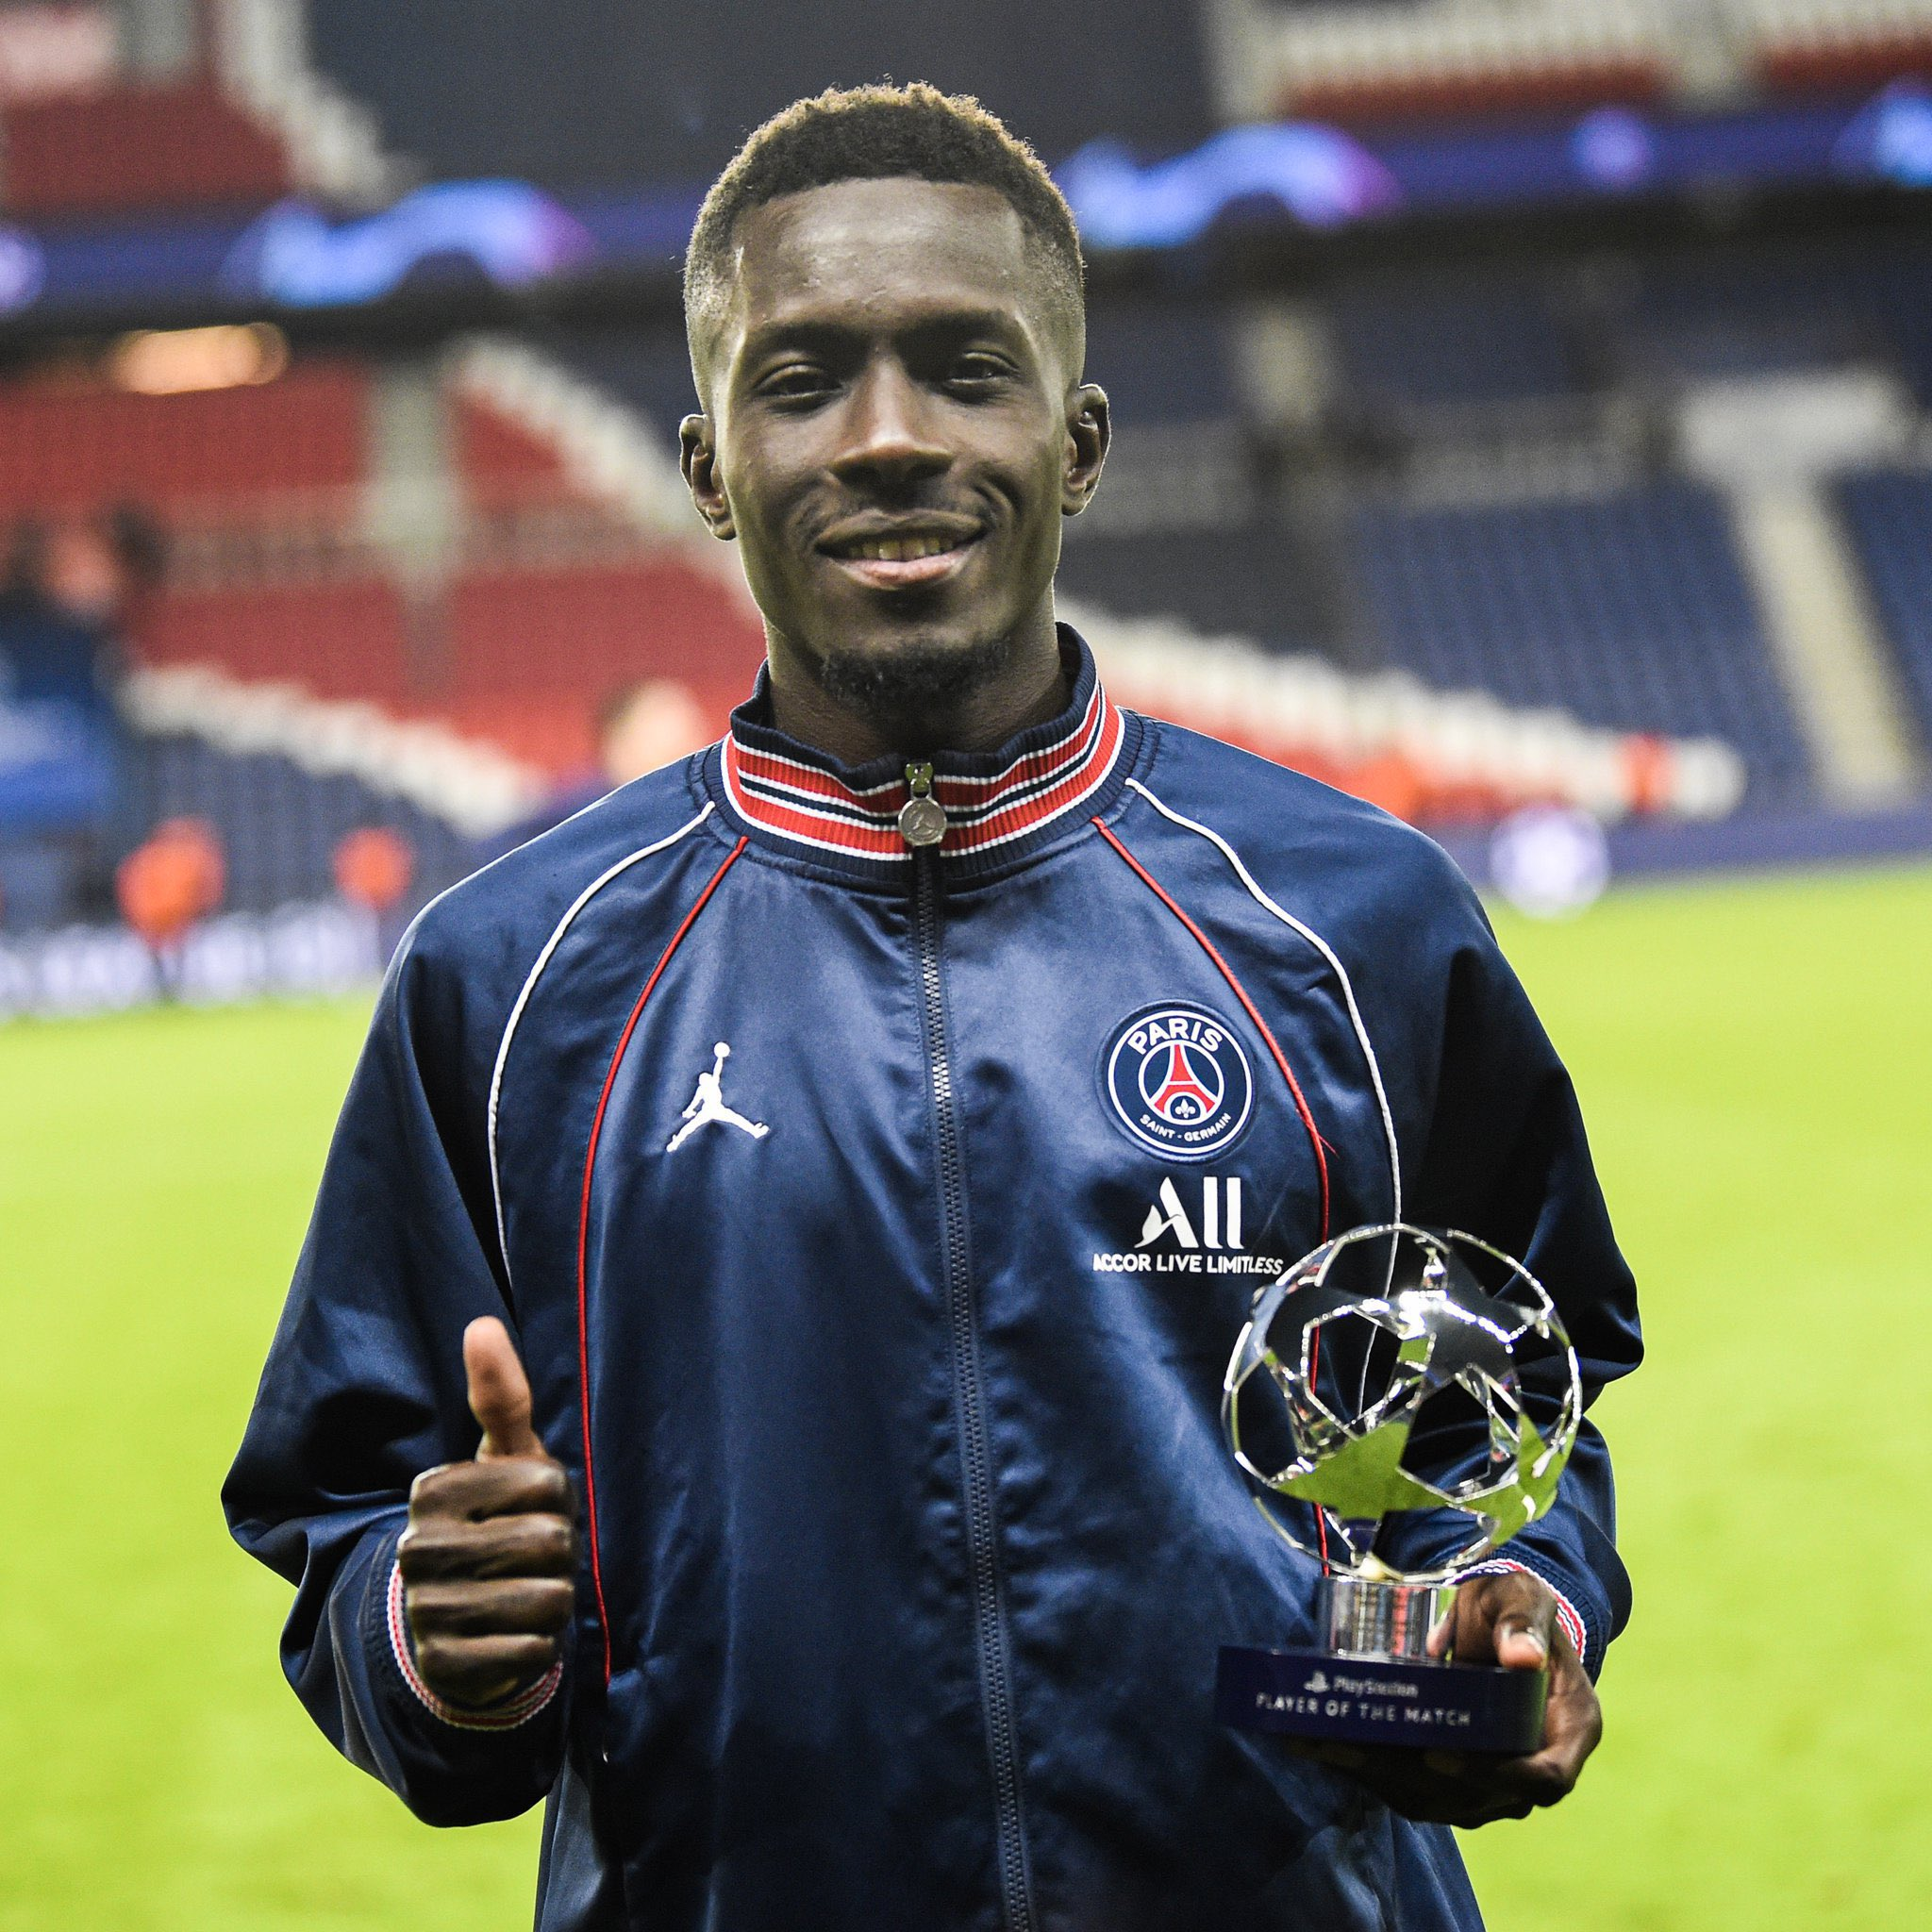 PSG-Man City: Gana Gueye élu homme du match